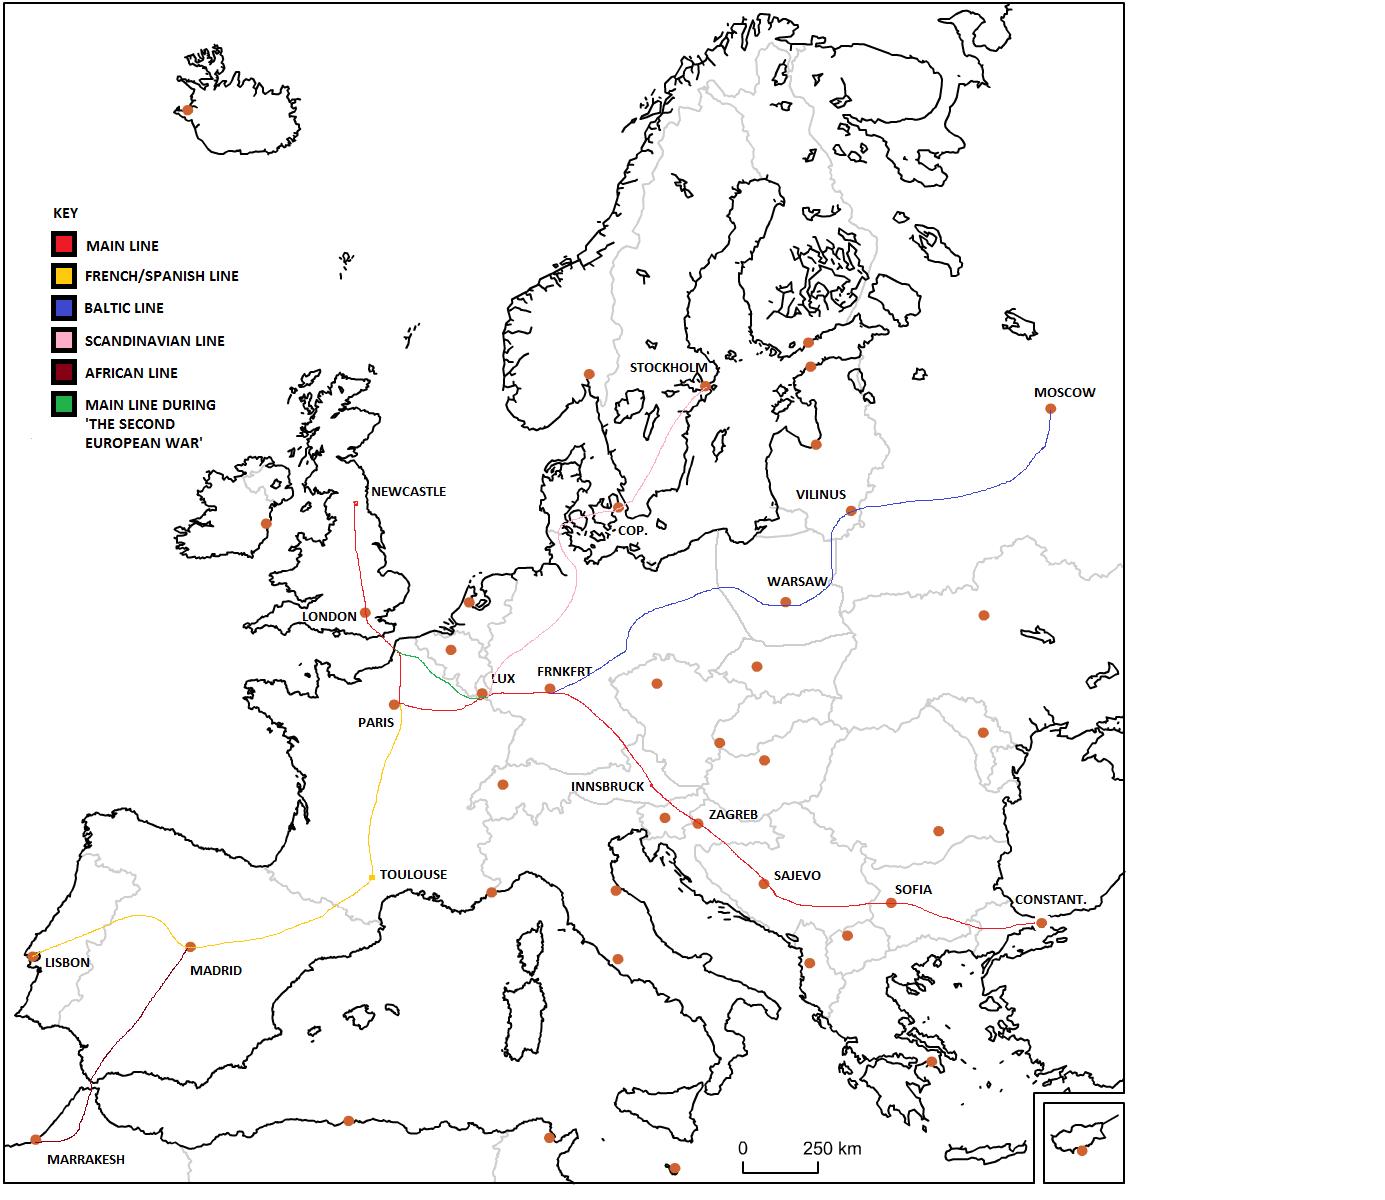 Grand European Railroad (The Great Cataclysm